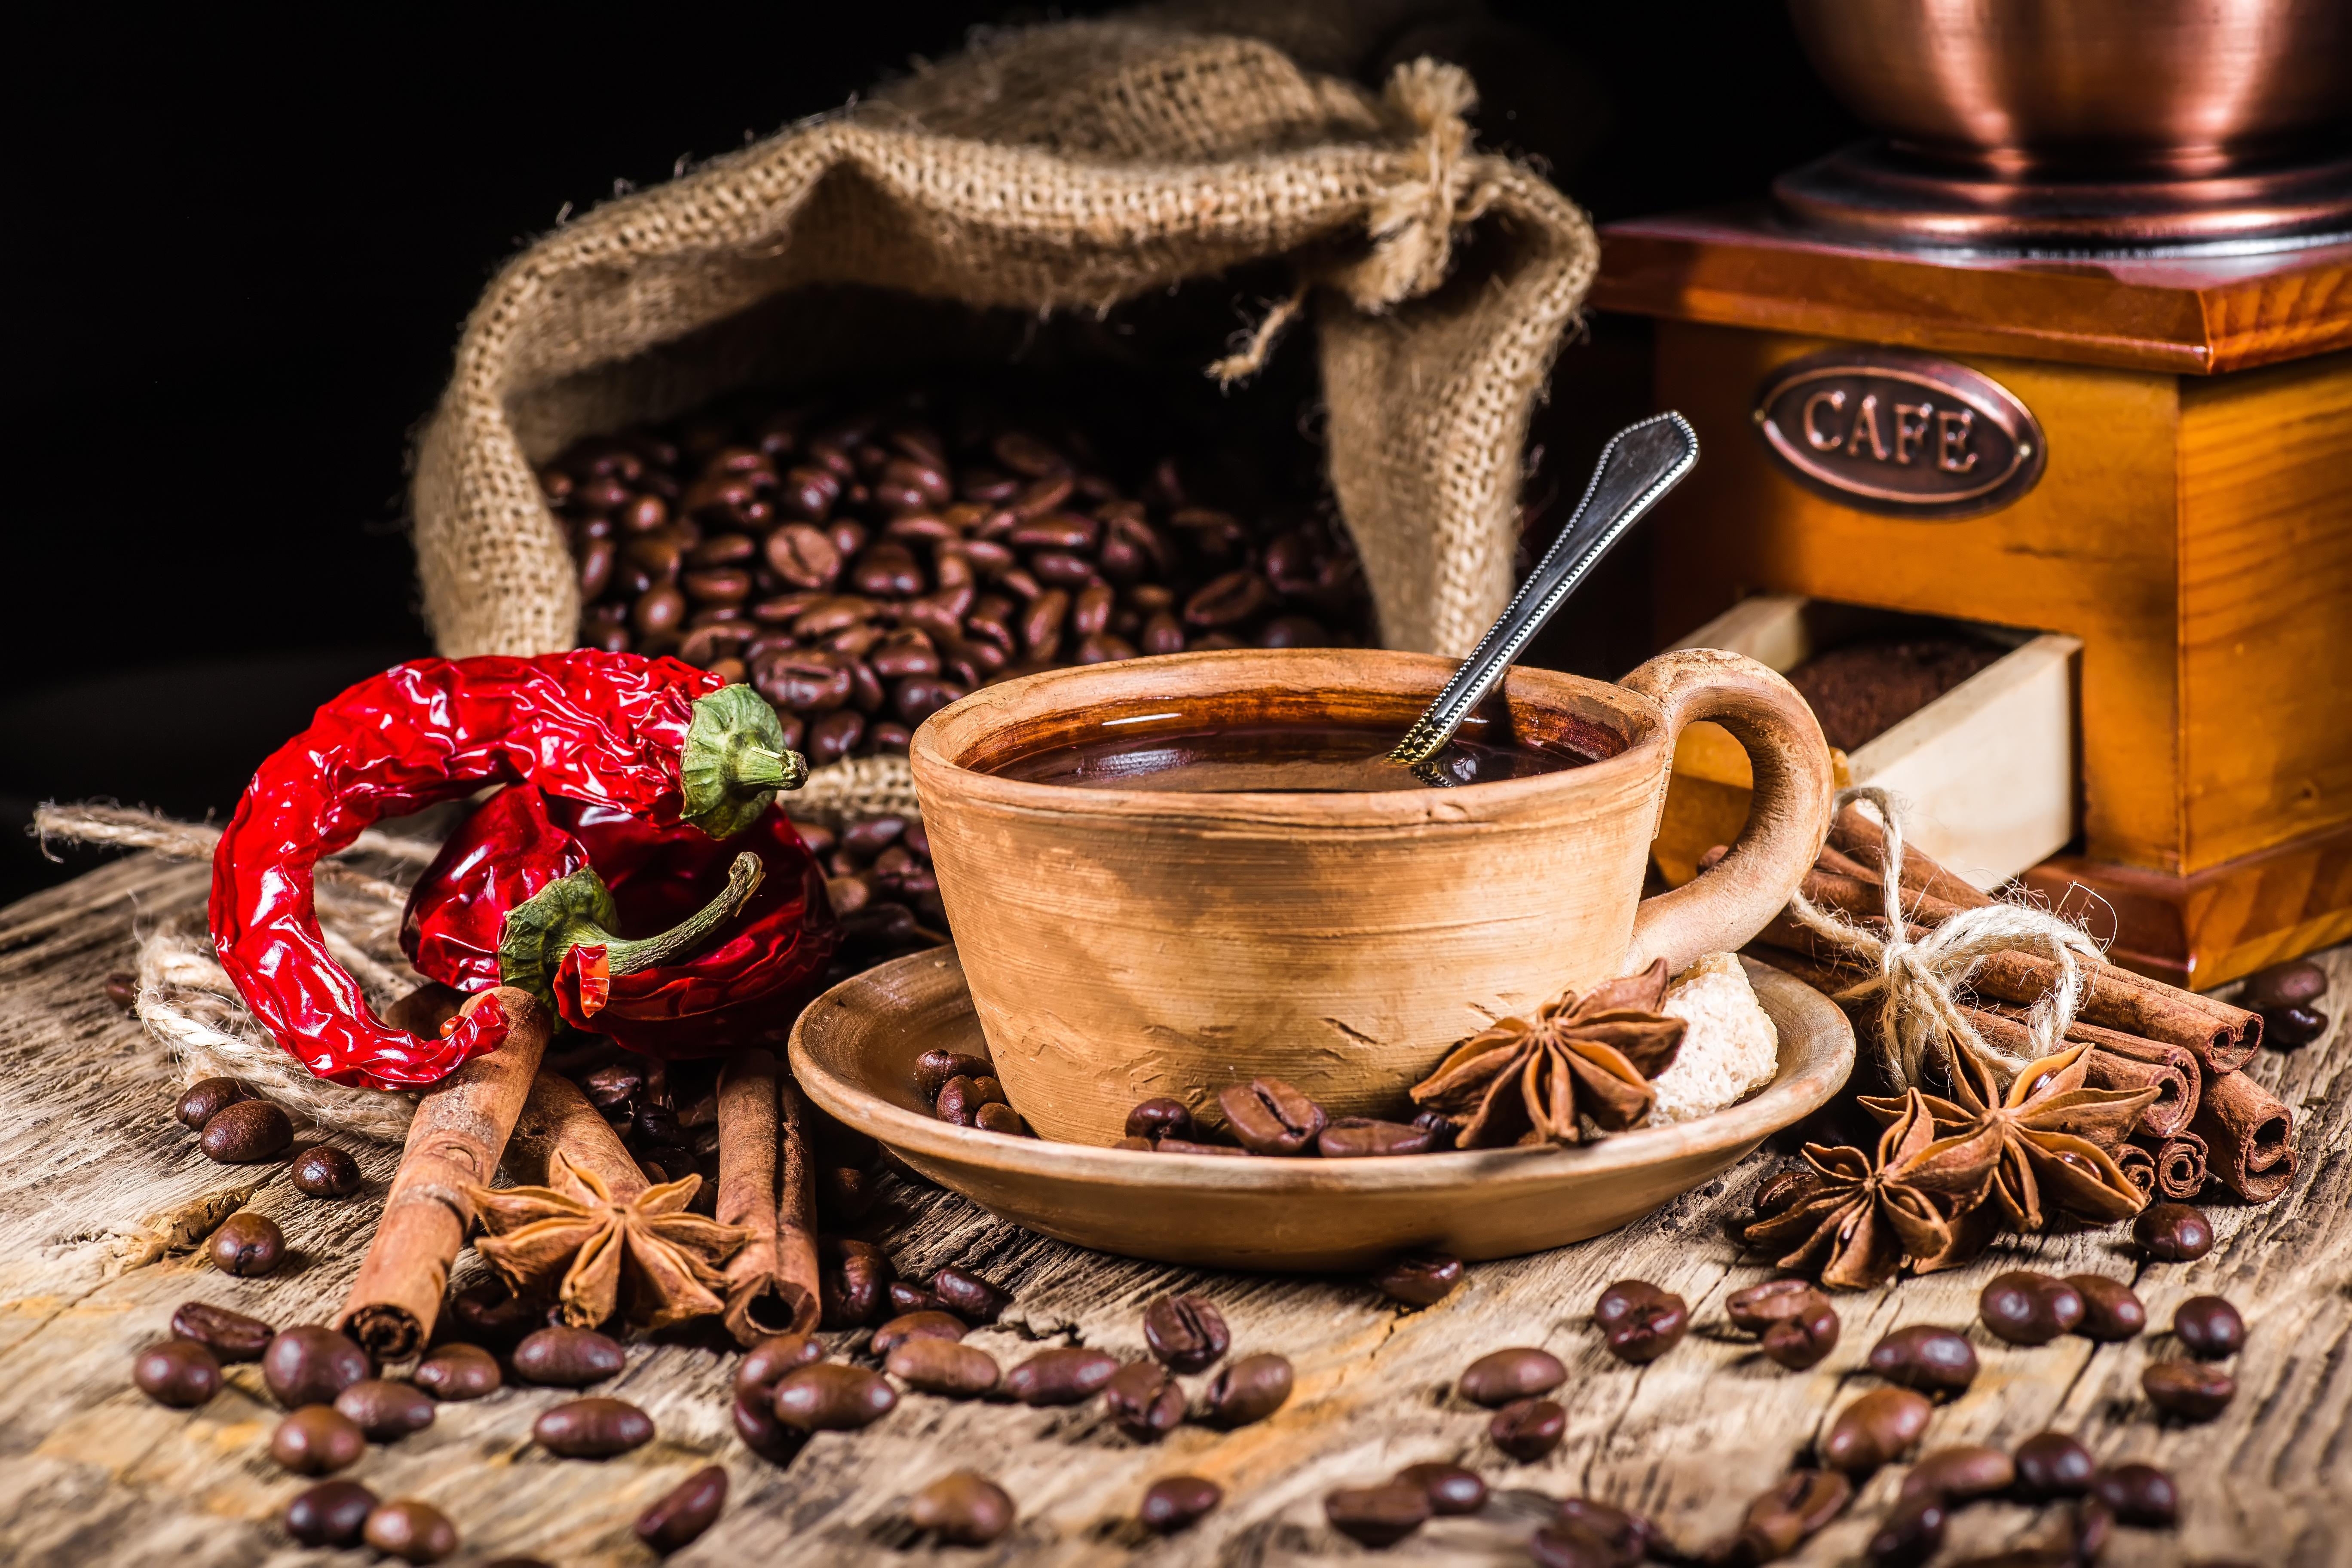 кофе еда картинки армянка варда призналась